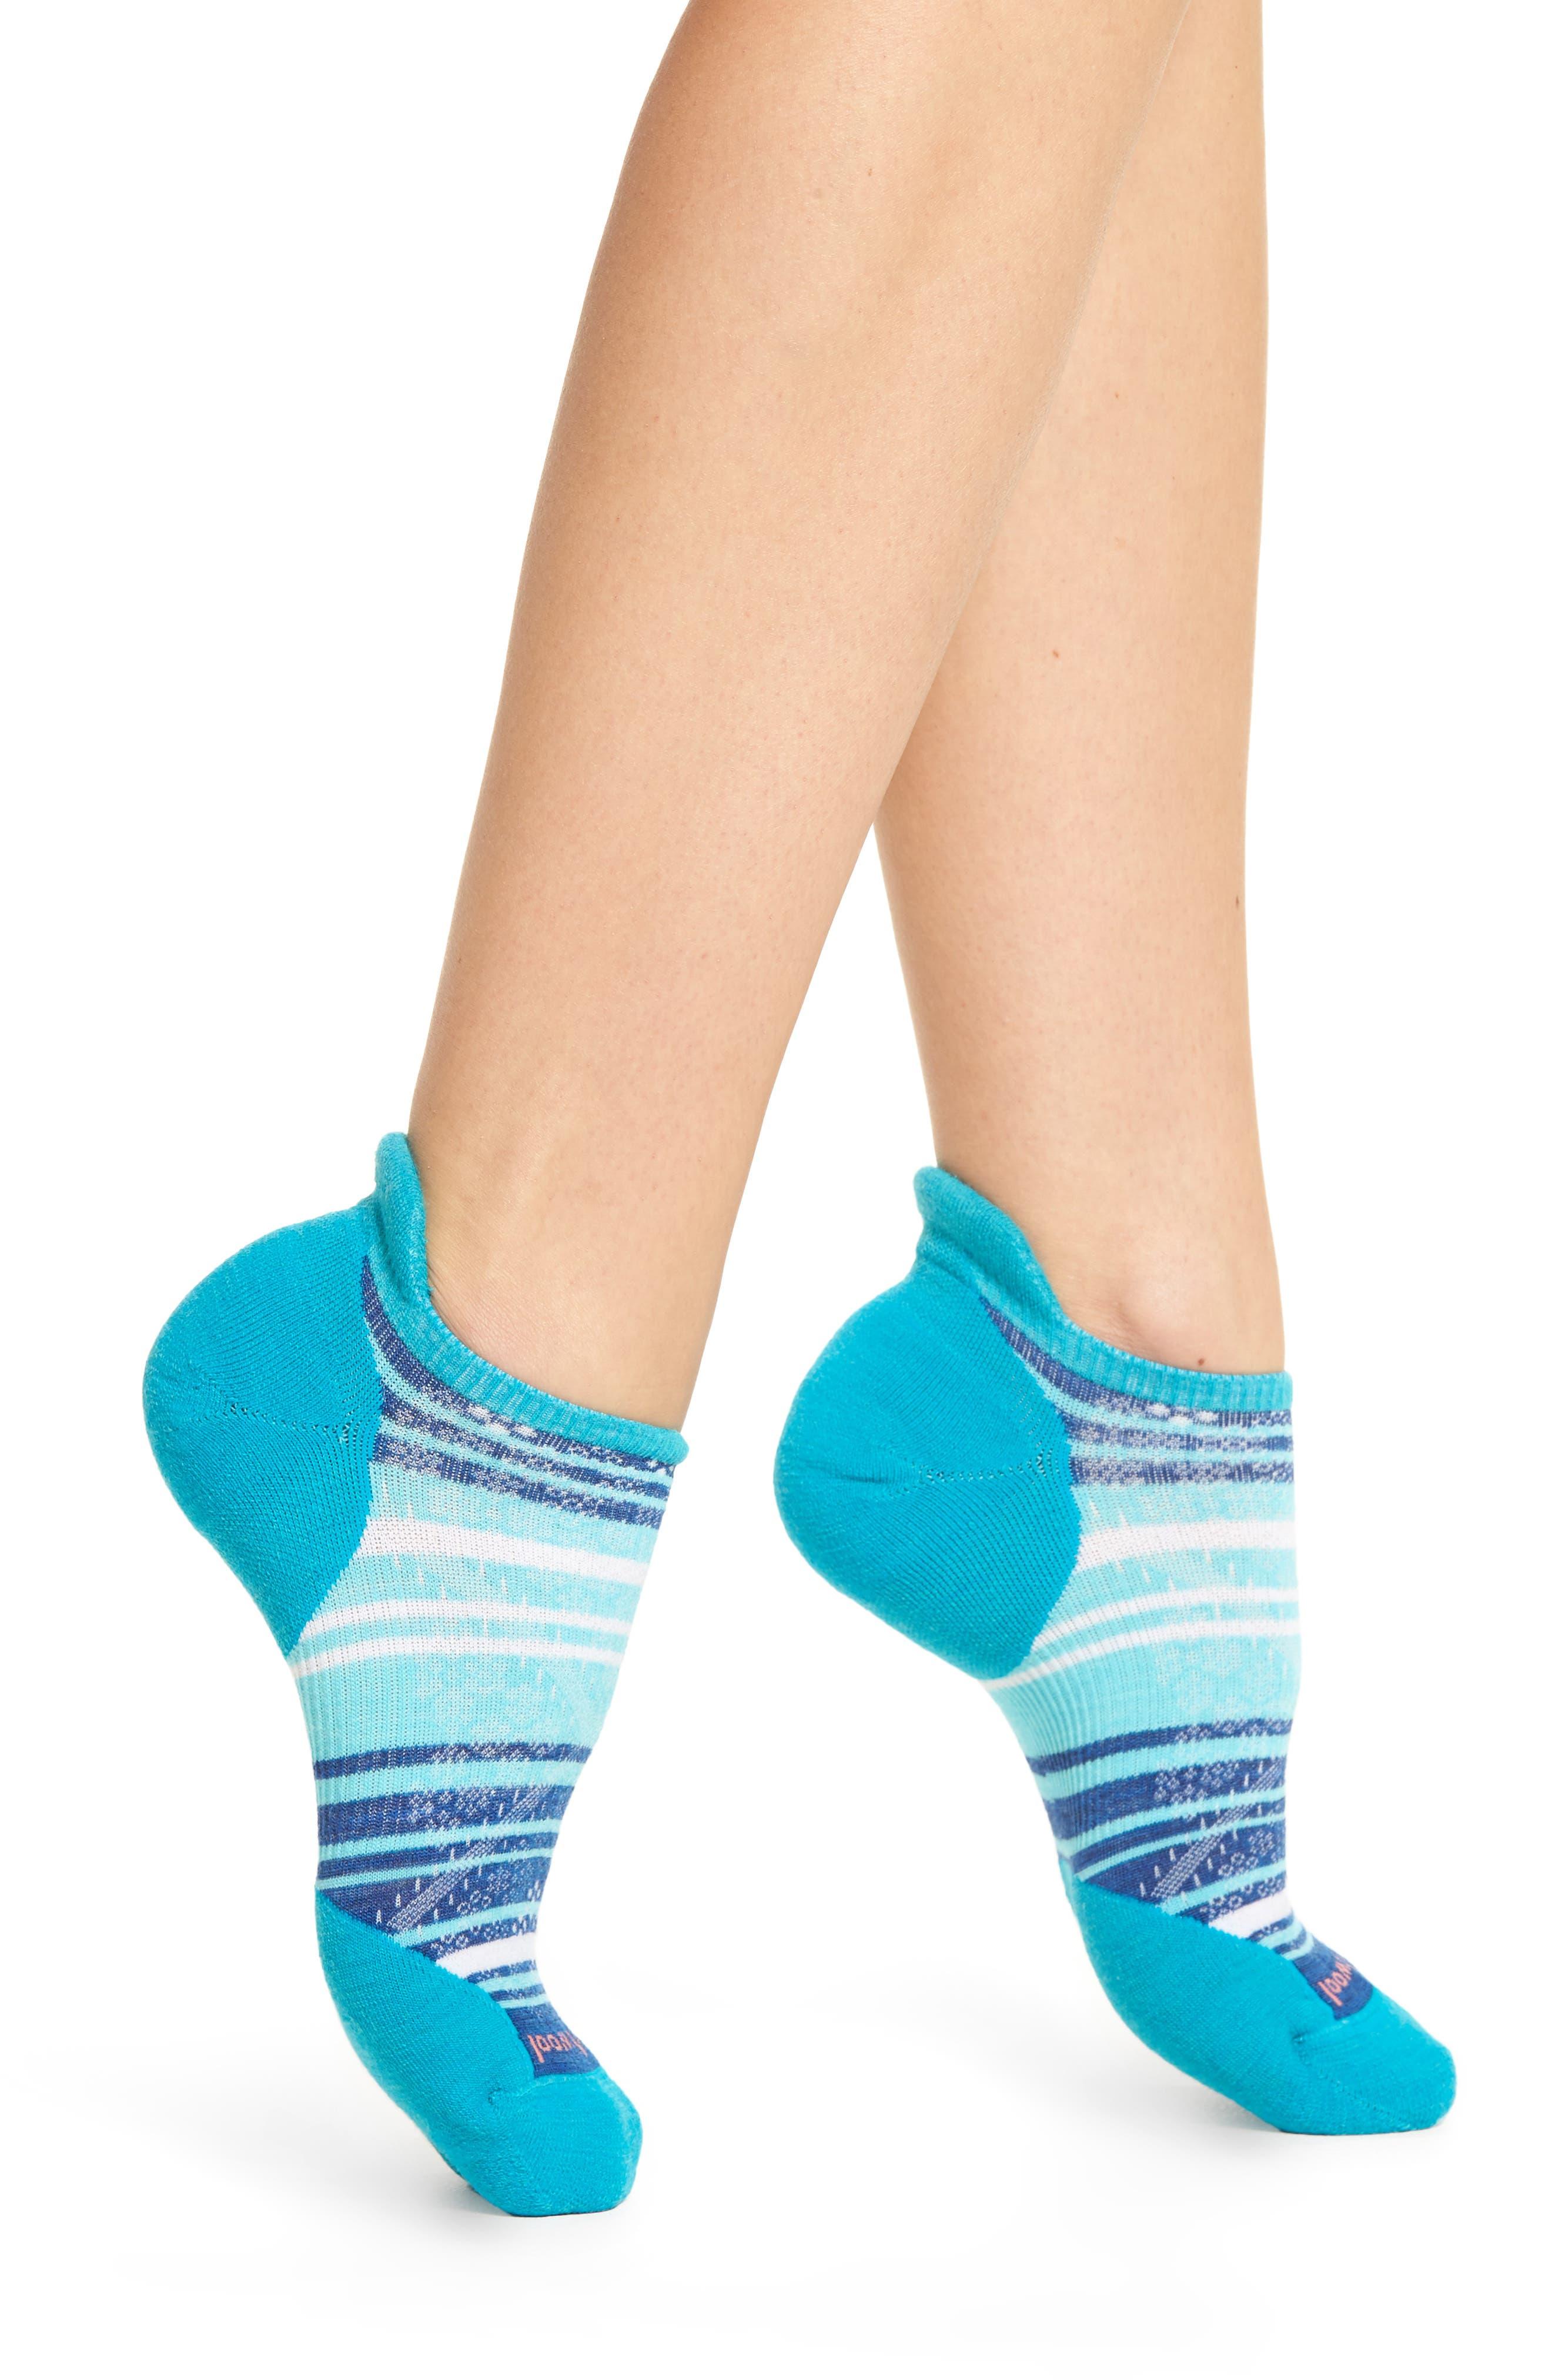 PhD Run Elite Micro No-Show Socks,                             Main thumbnail 1, color,                             440